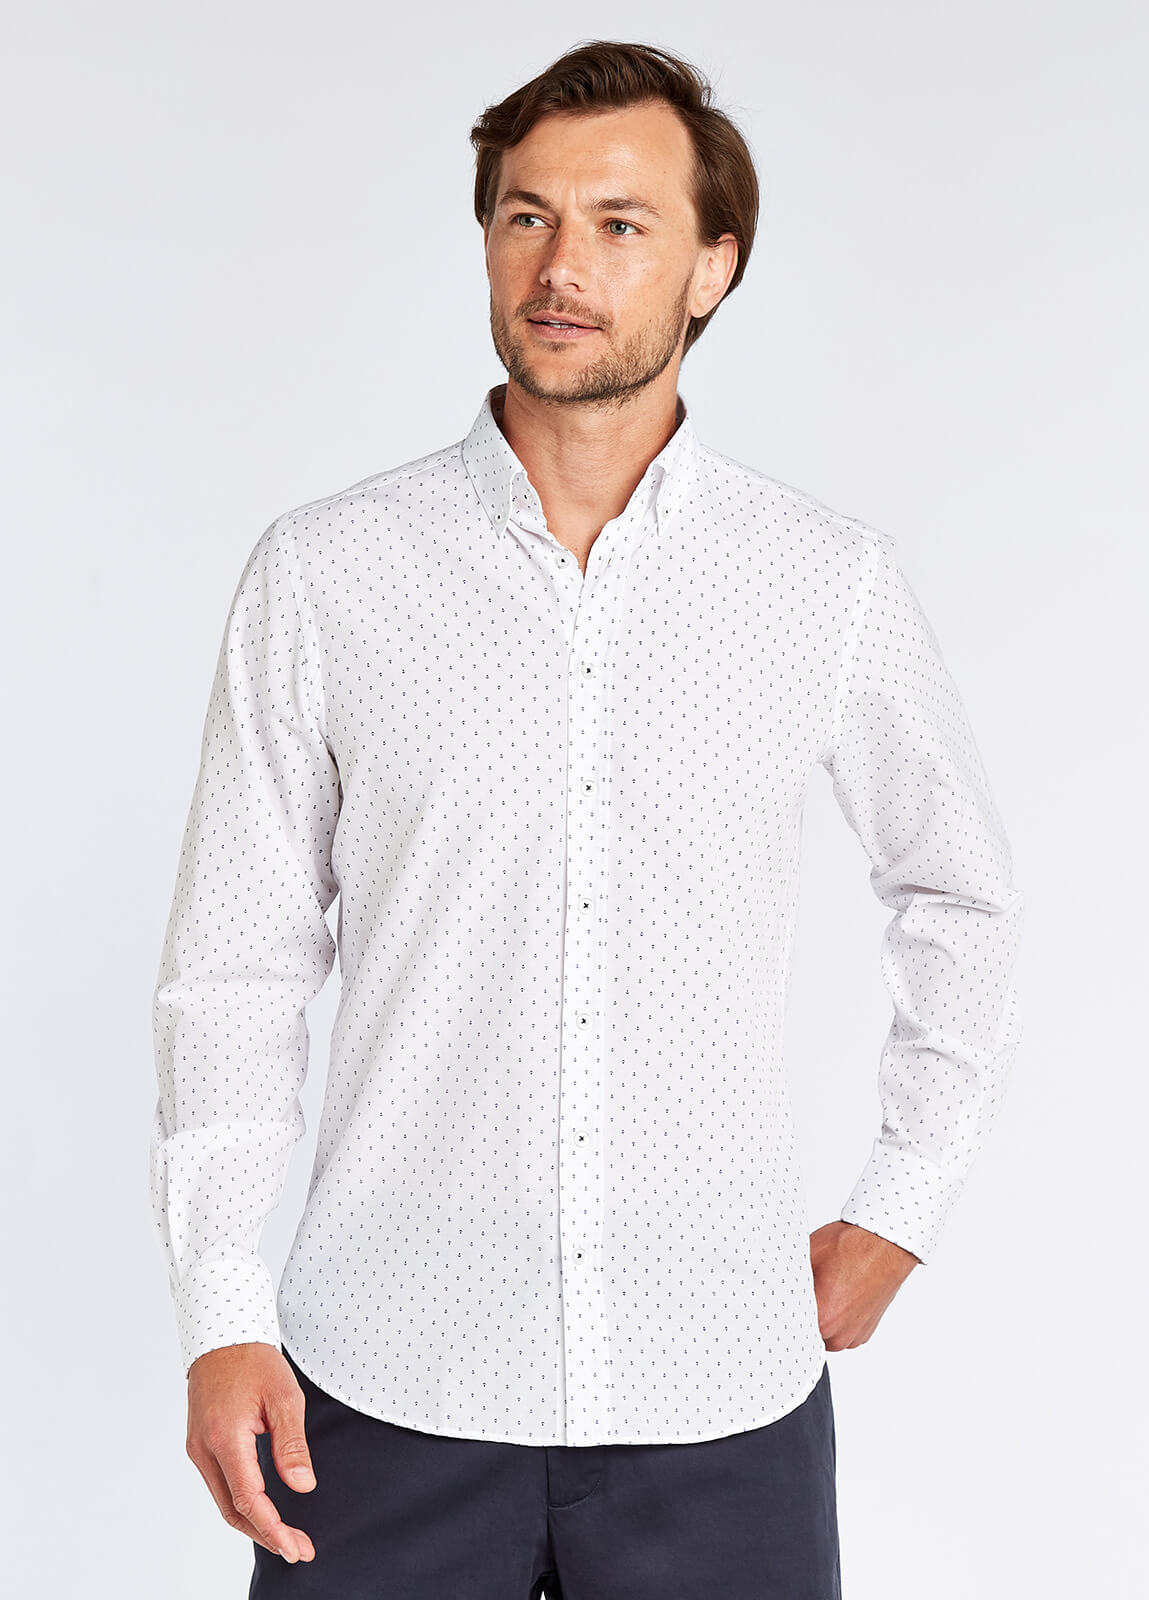 Sandymount Print Shirt - White Multi